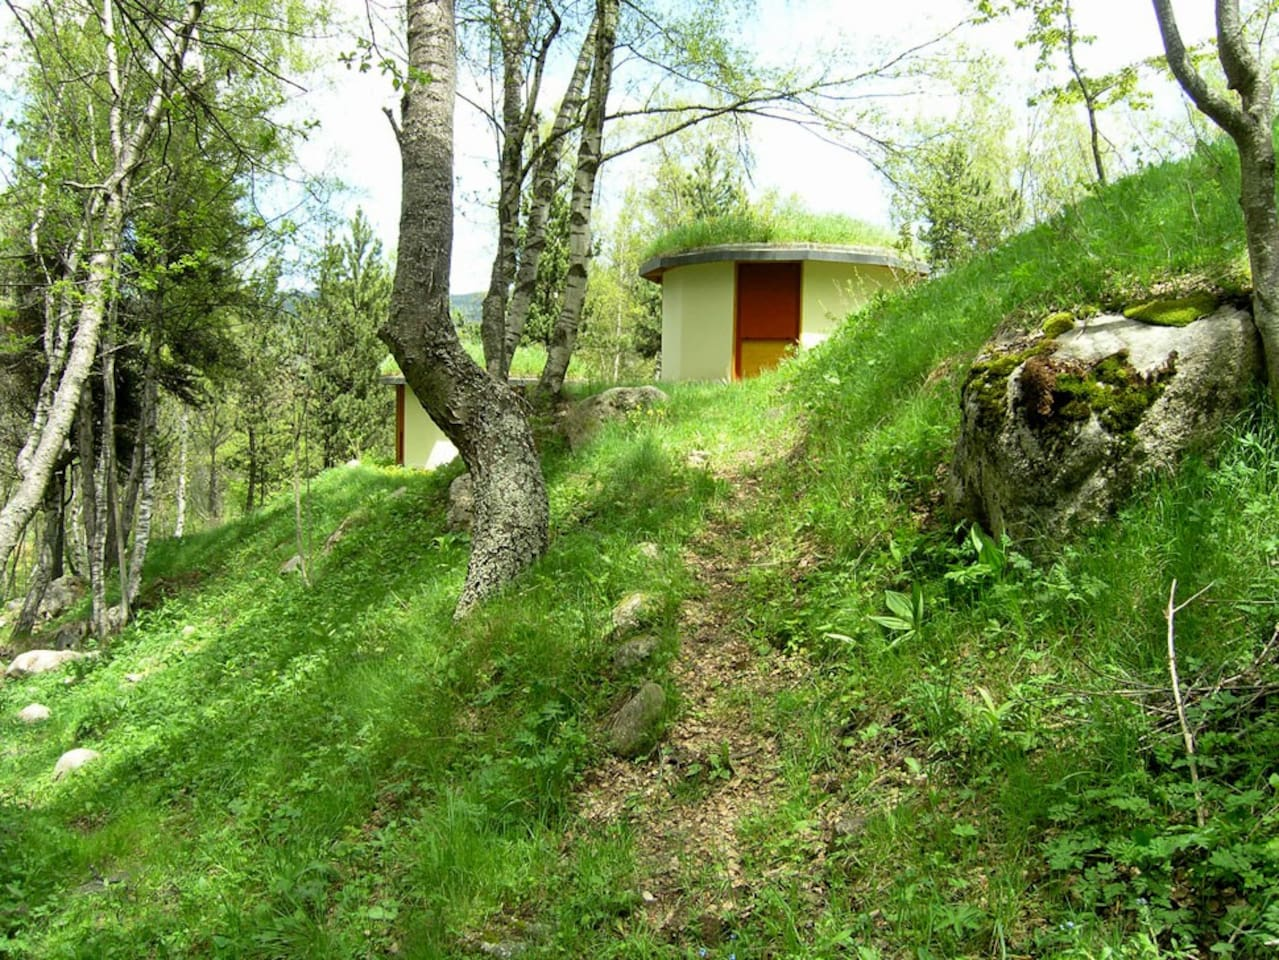 yurt in environment